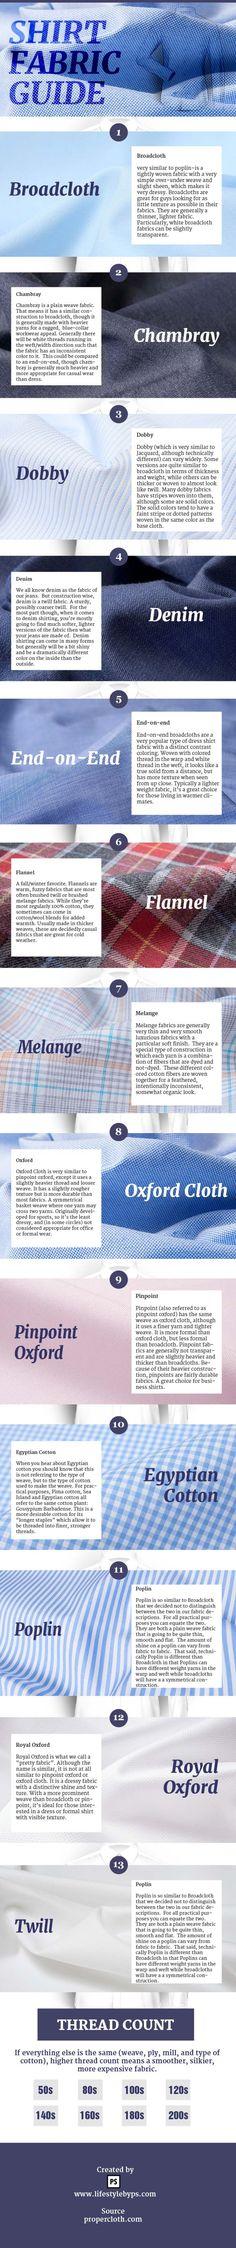 shirt-fabric-guide-infographic_532979cd85f8c_w1500.jpg (1500×14292)